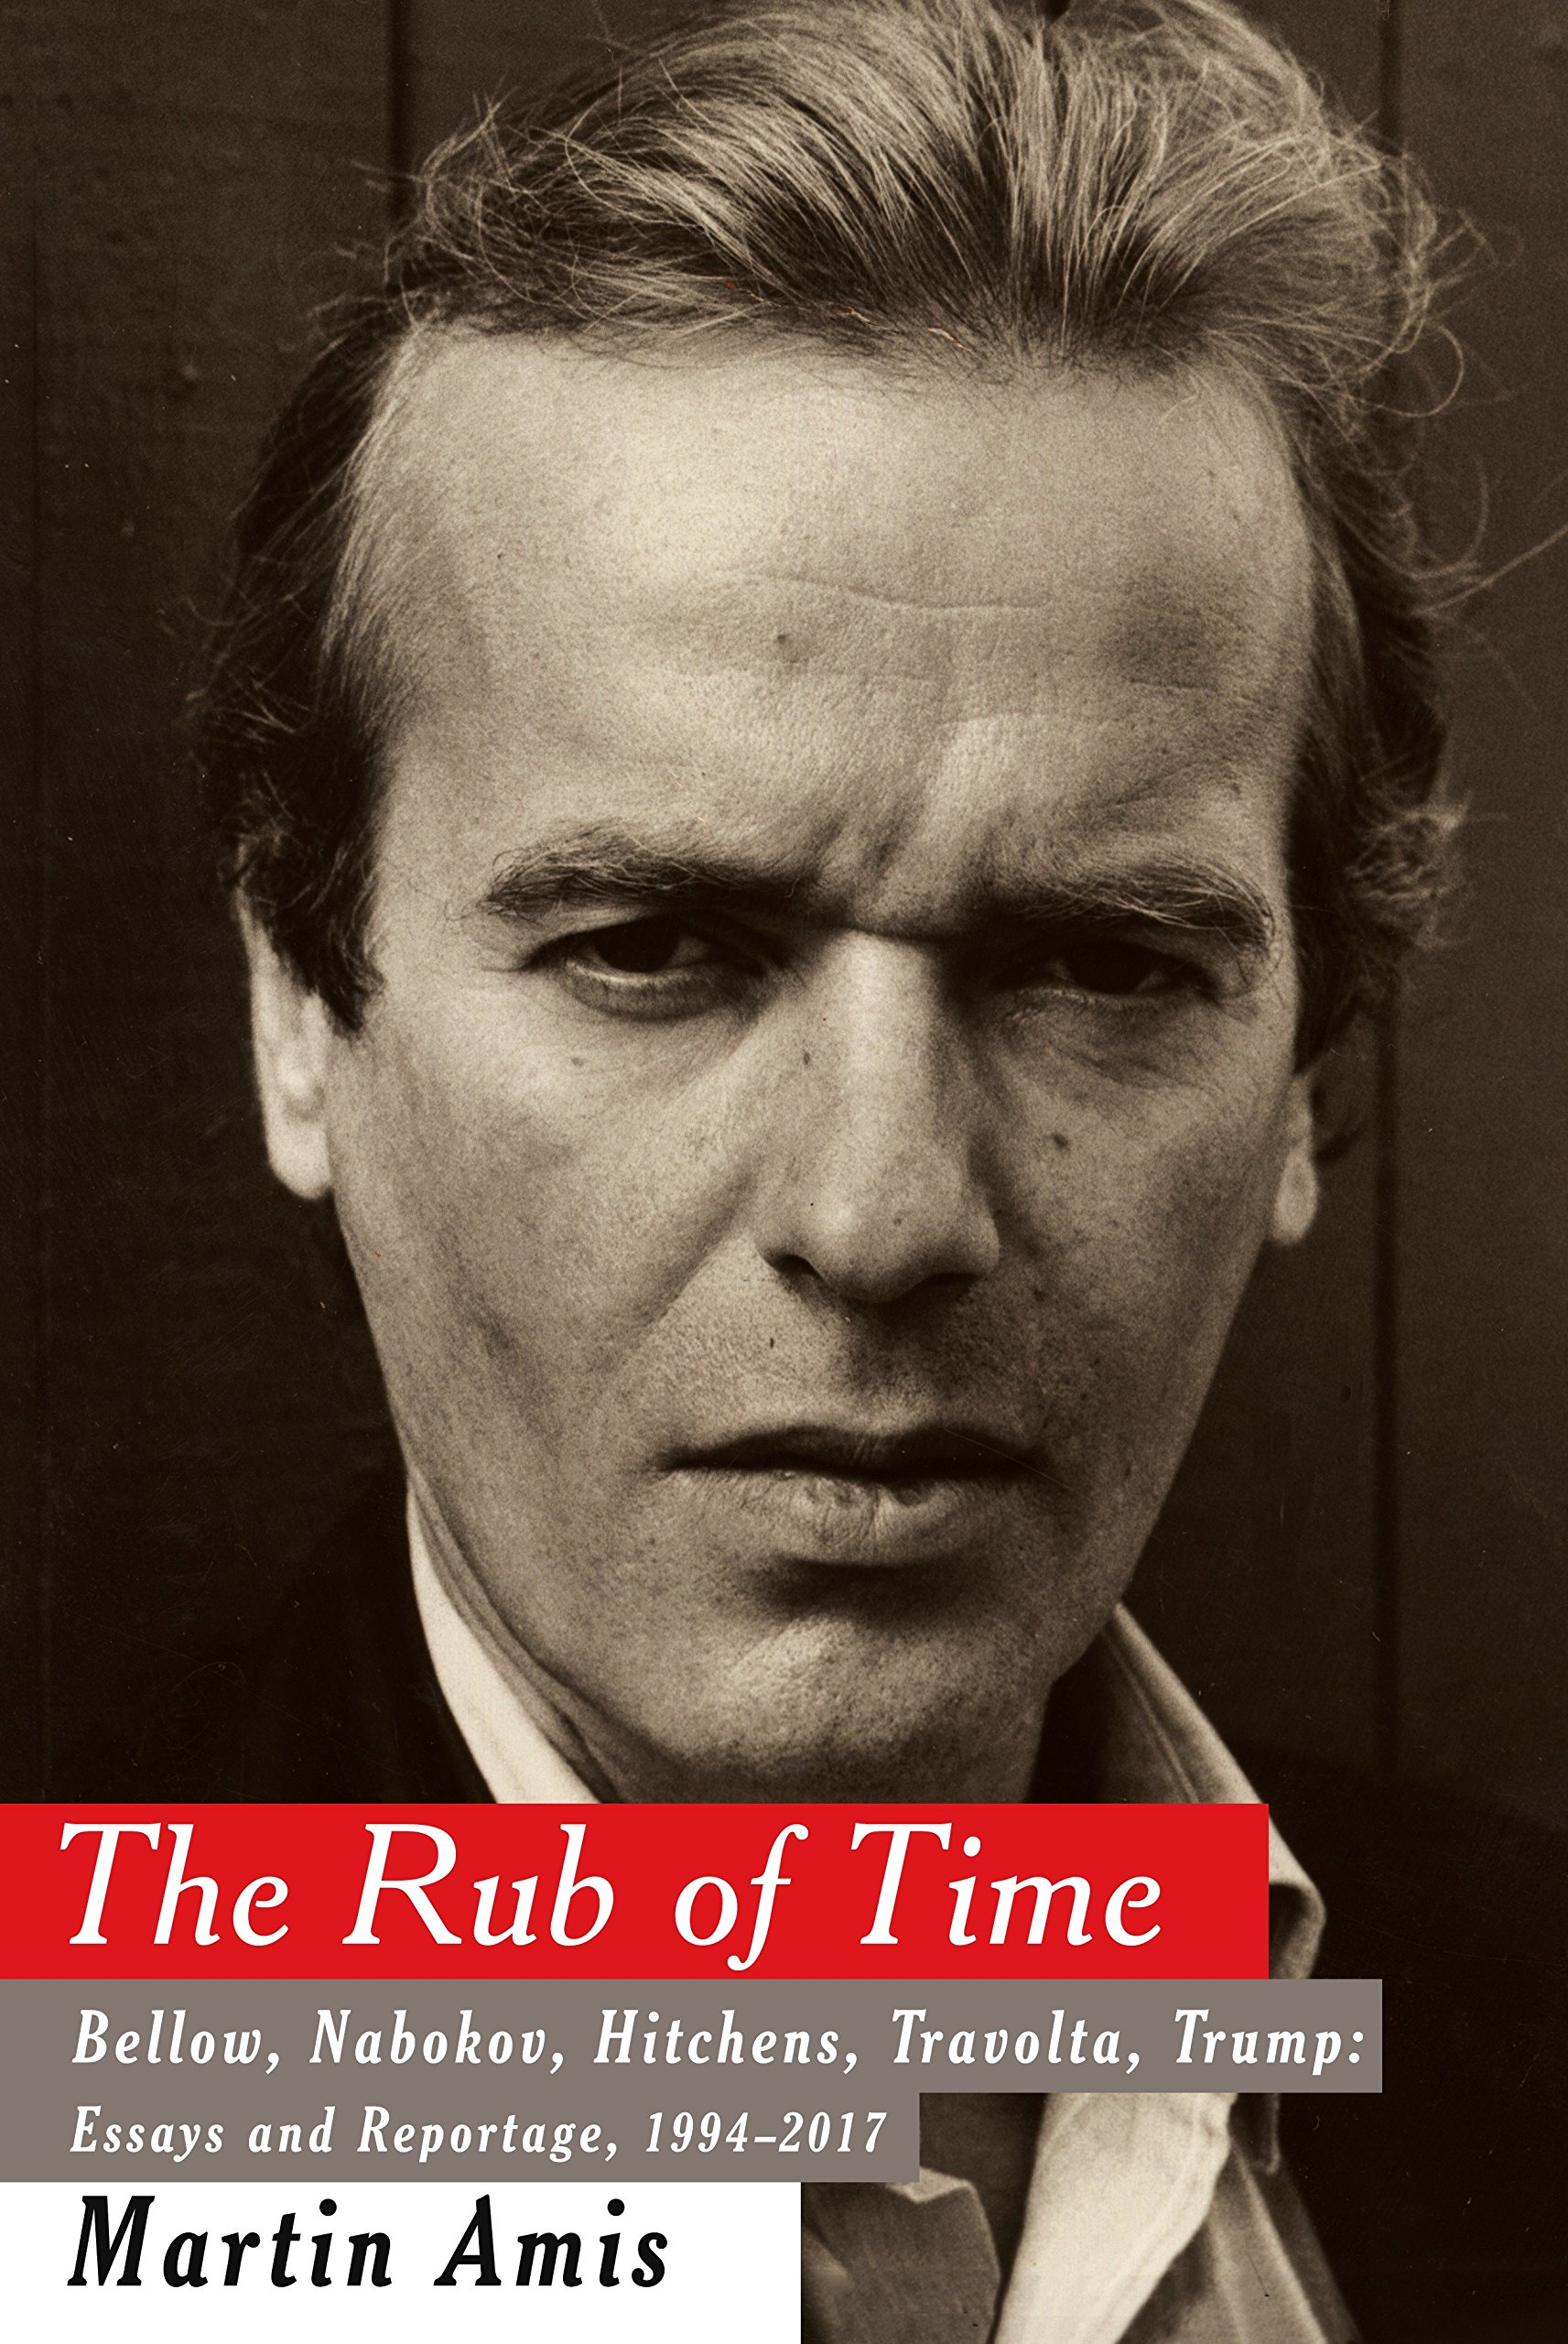 The Rub of Time: Bellow, Nabokov, Hitchens, Travolta, Trump: Essays ...